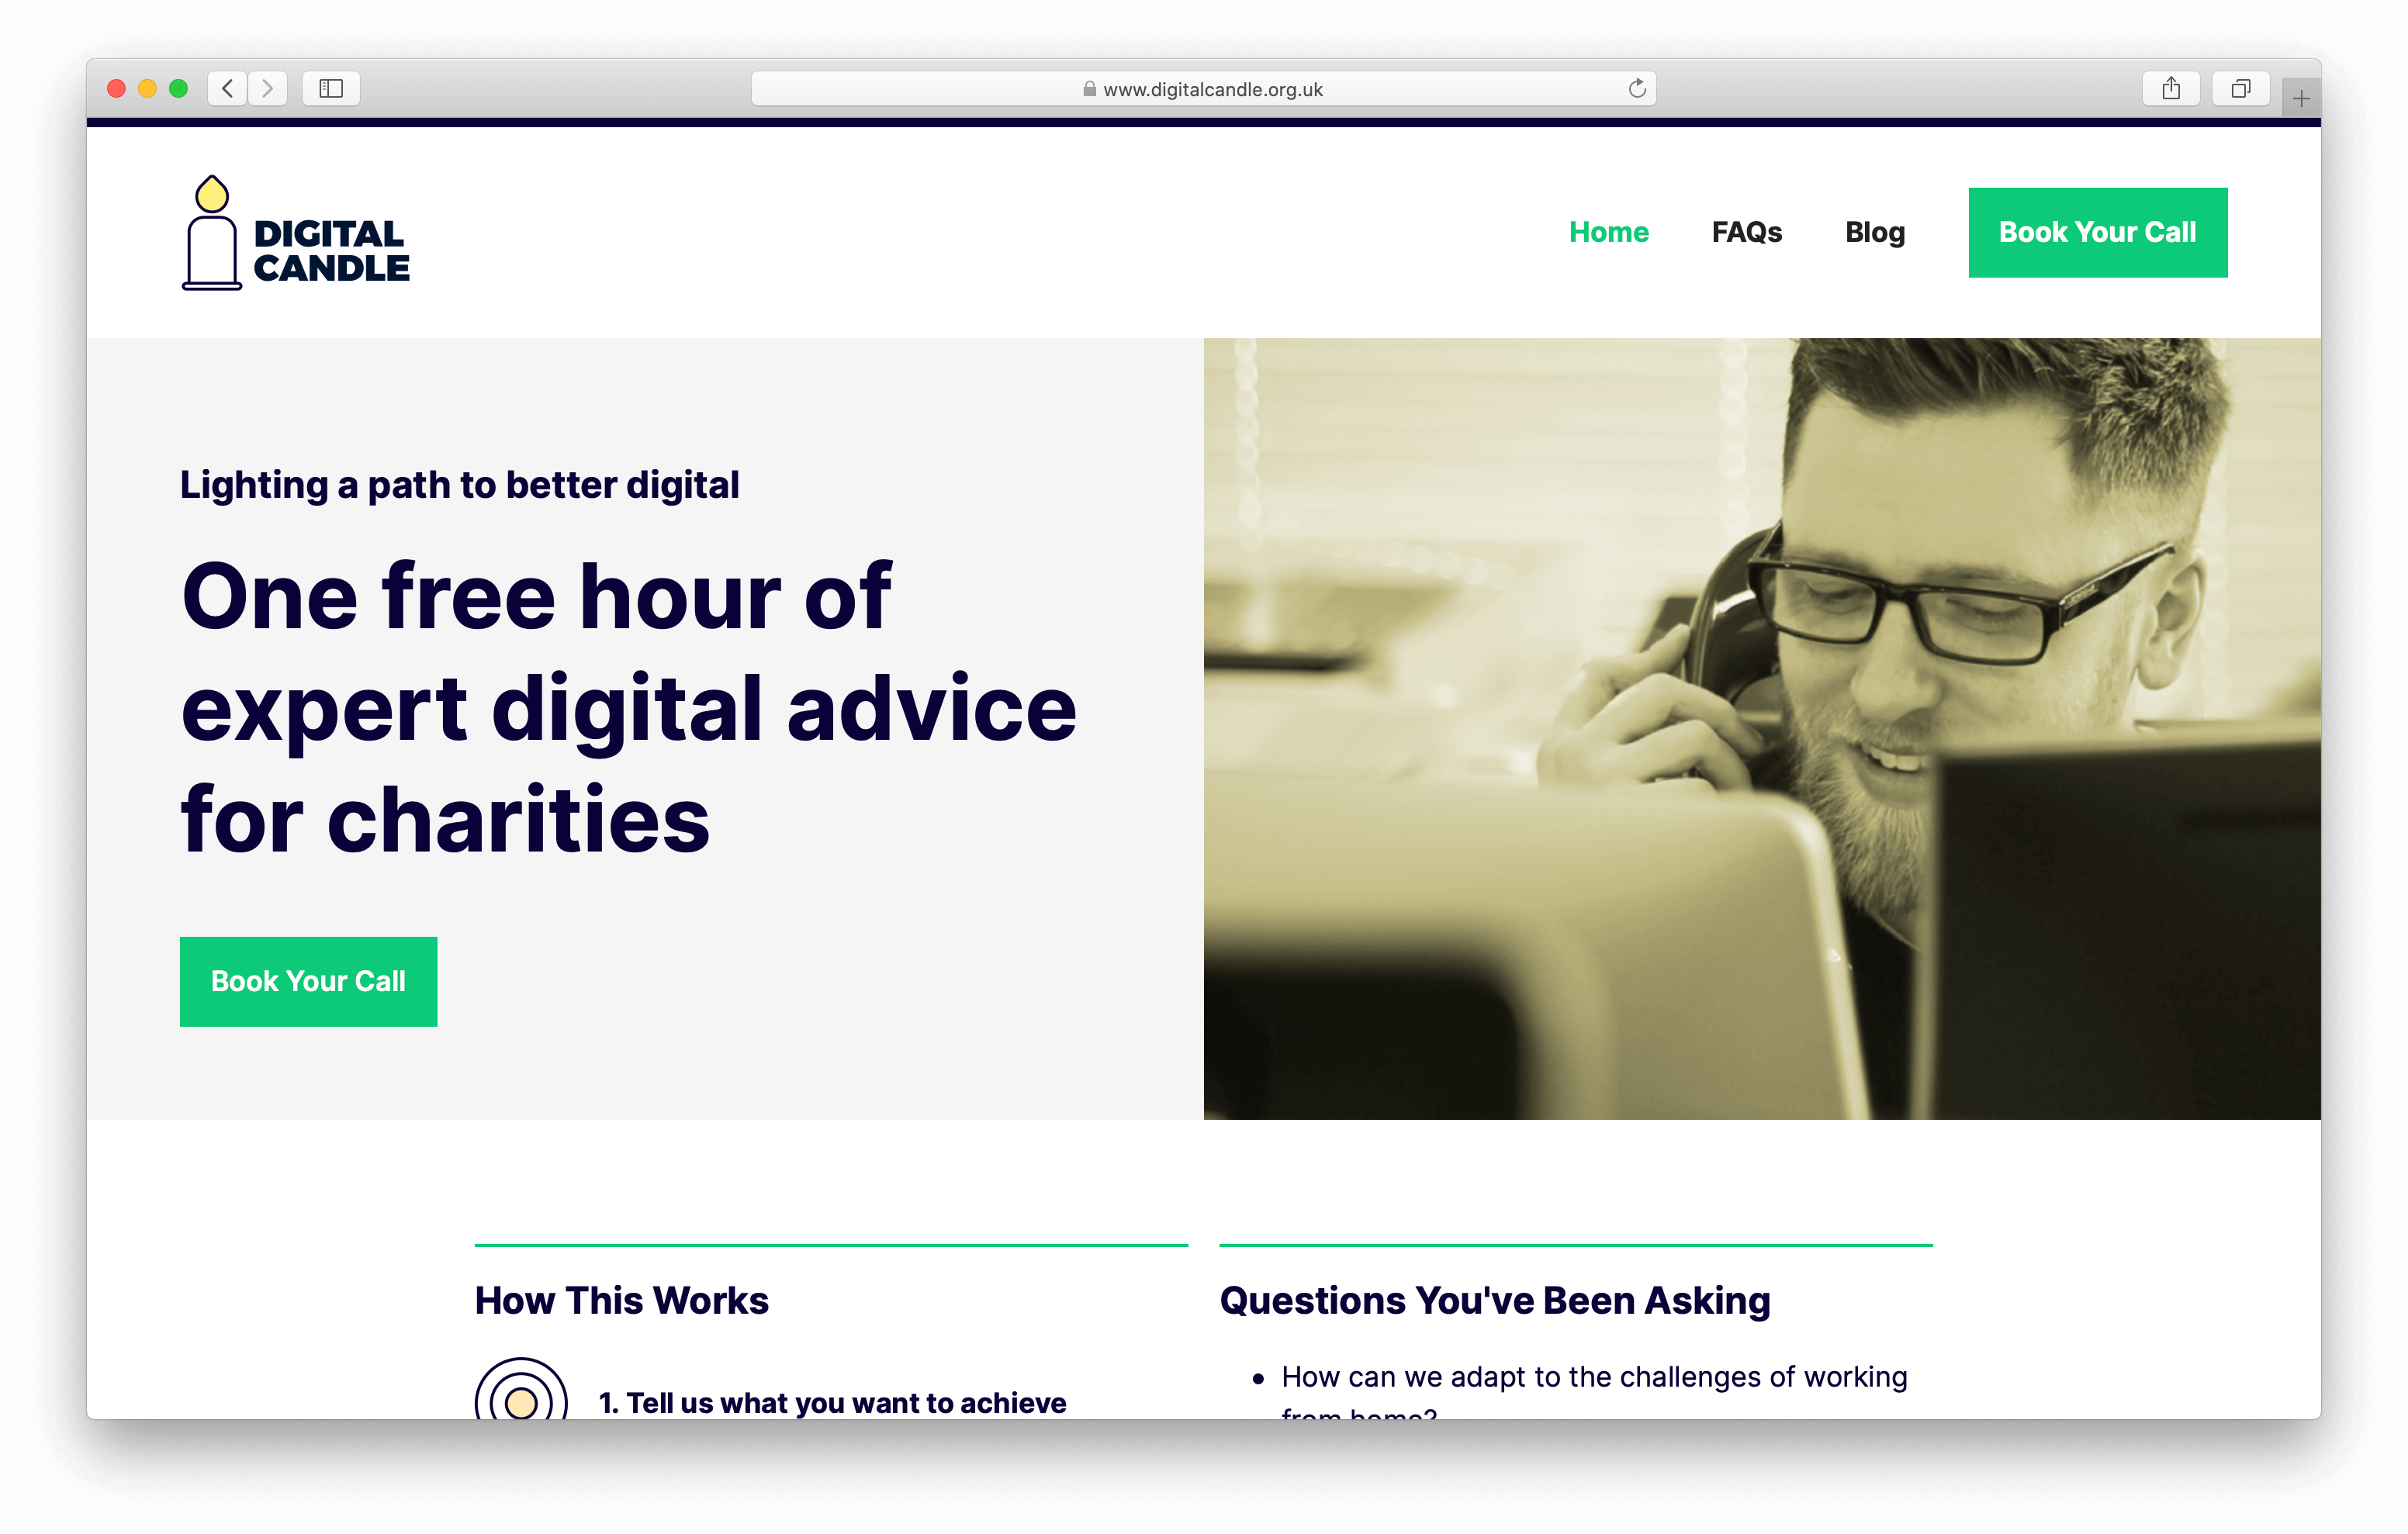 Digital candle website screenshot